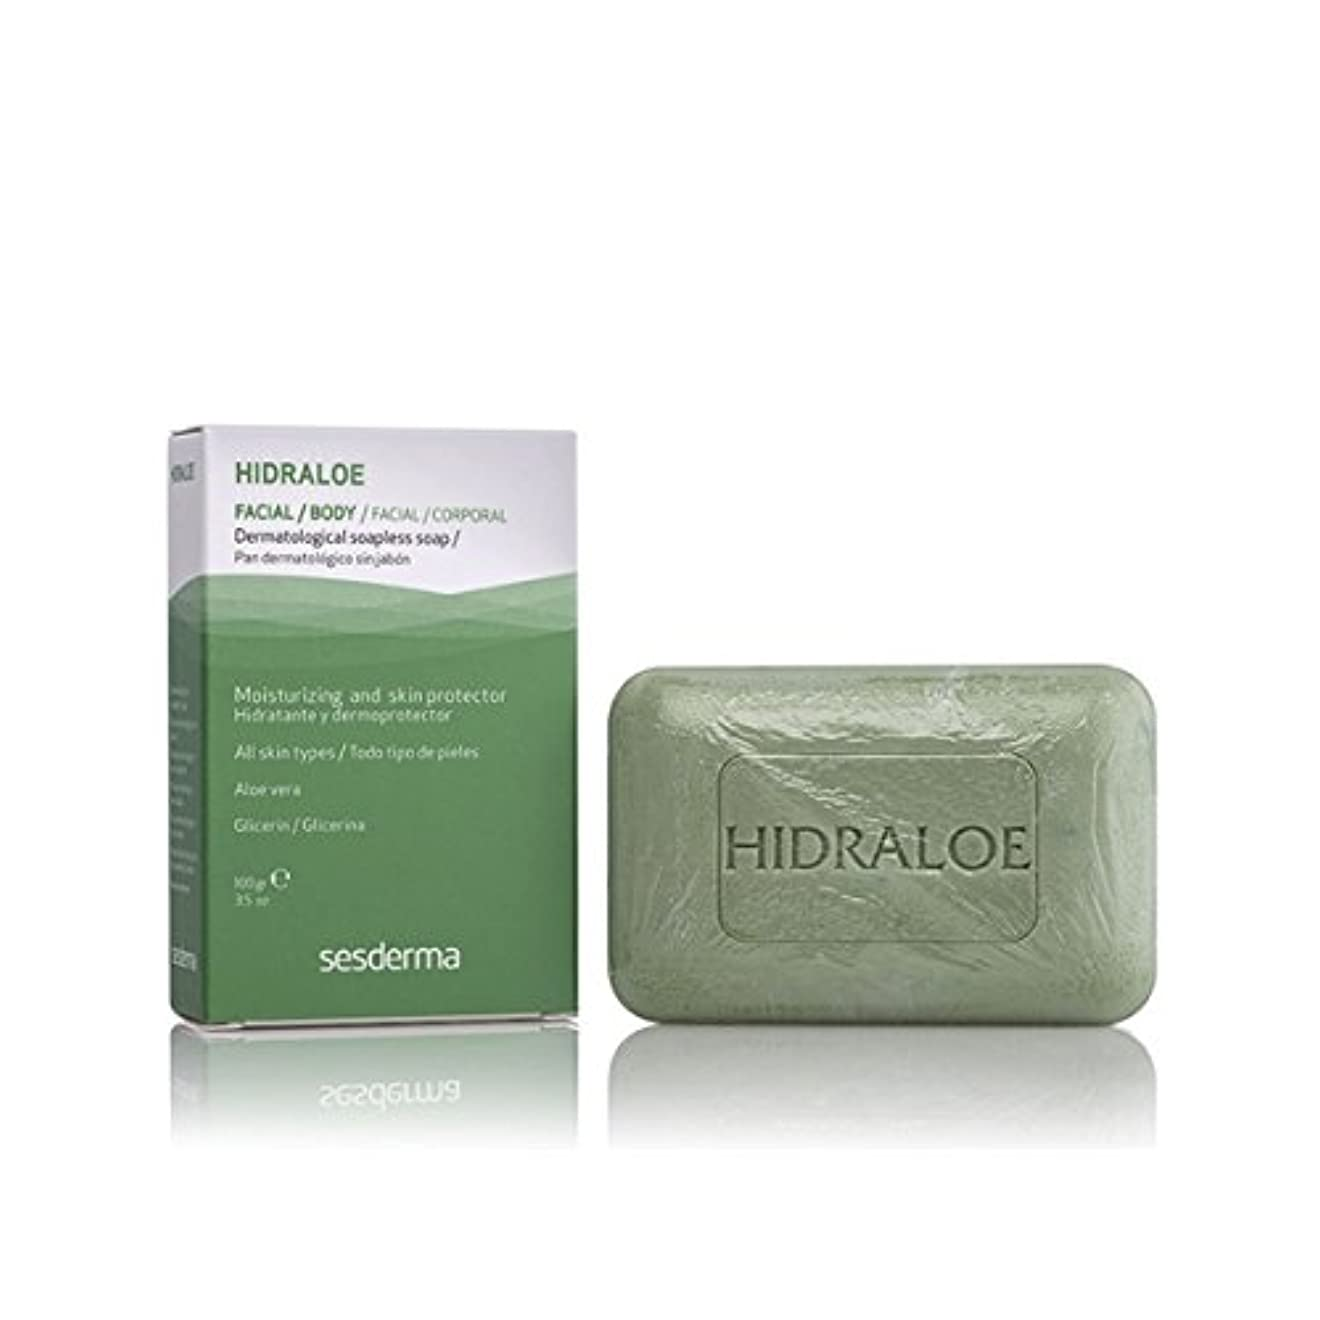 Sesderma Hidraloe Dermatological Soapless Soap 100gr [並行輸入品]